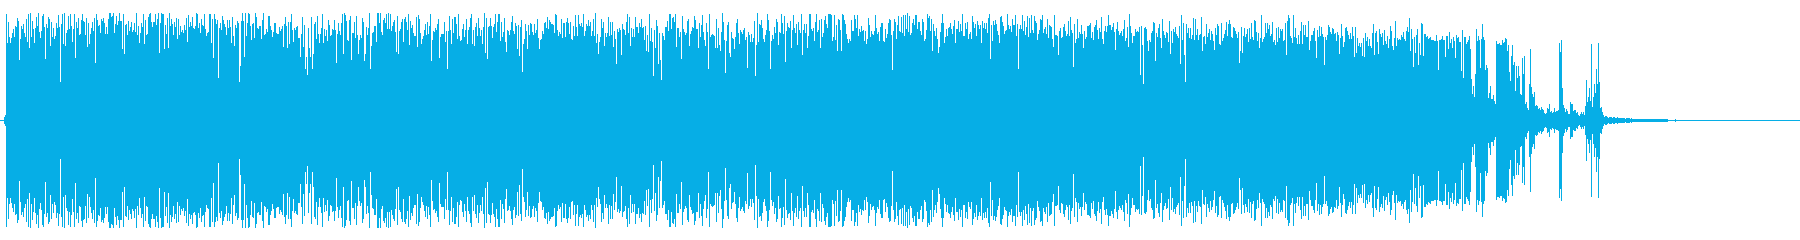 KANT 怪獣が変身する効果音1の再生済みの波形